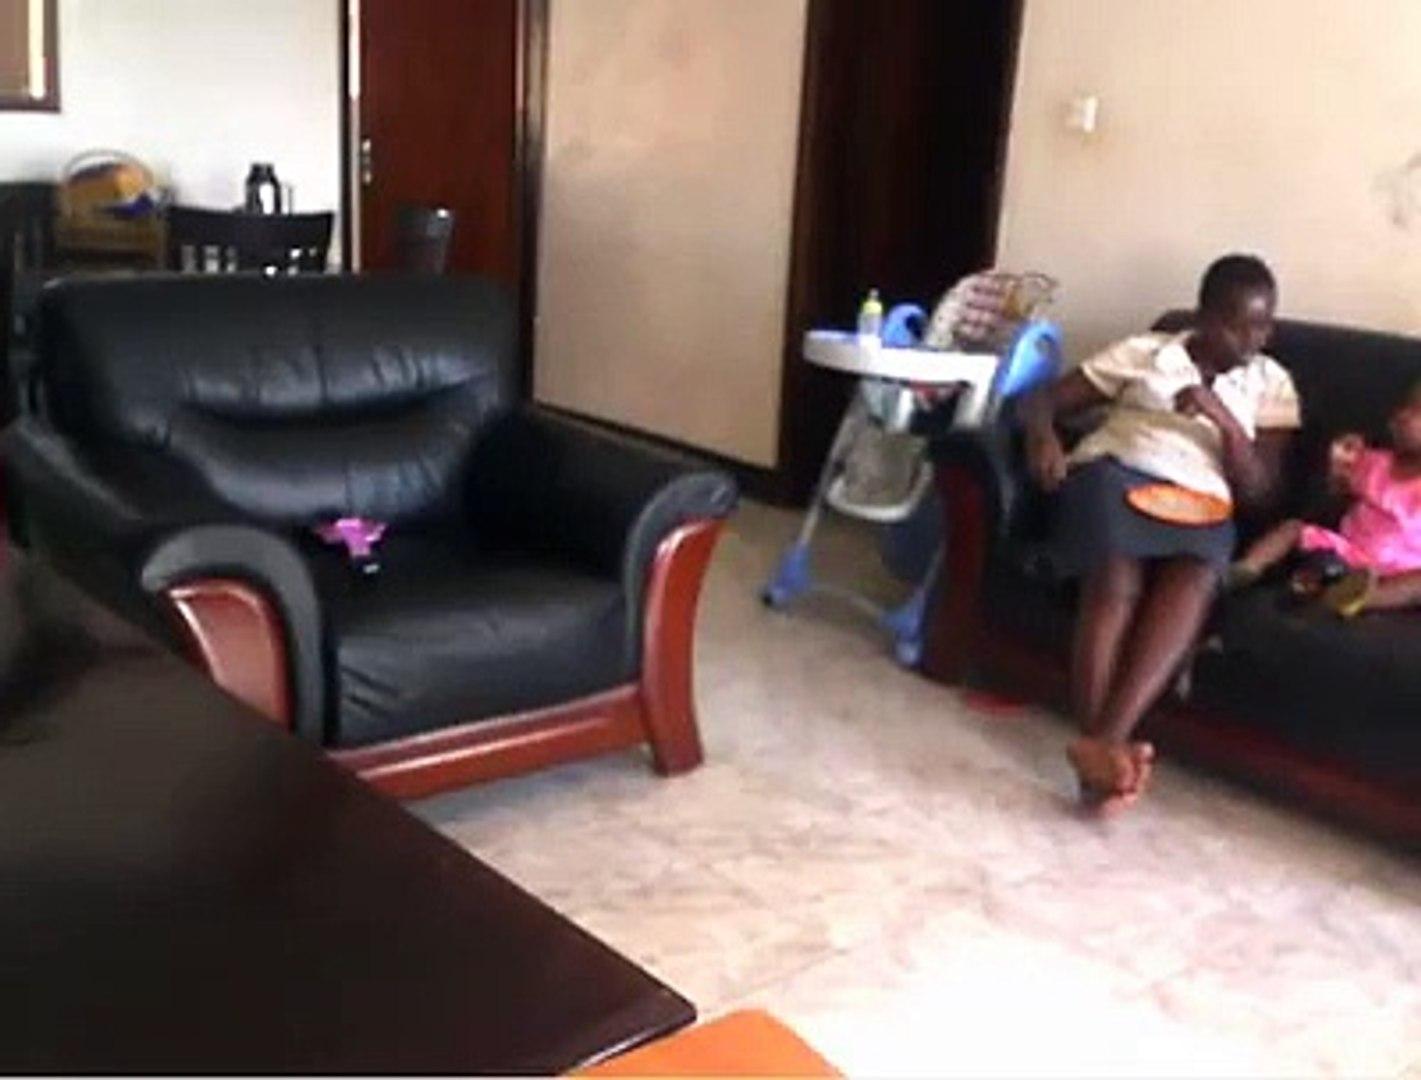 NANNY JOLLY TUMUHIIRWE VIOLENTLY BEATS 18M TODDLER IN UGANDA CAUGHT ON CAM